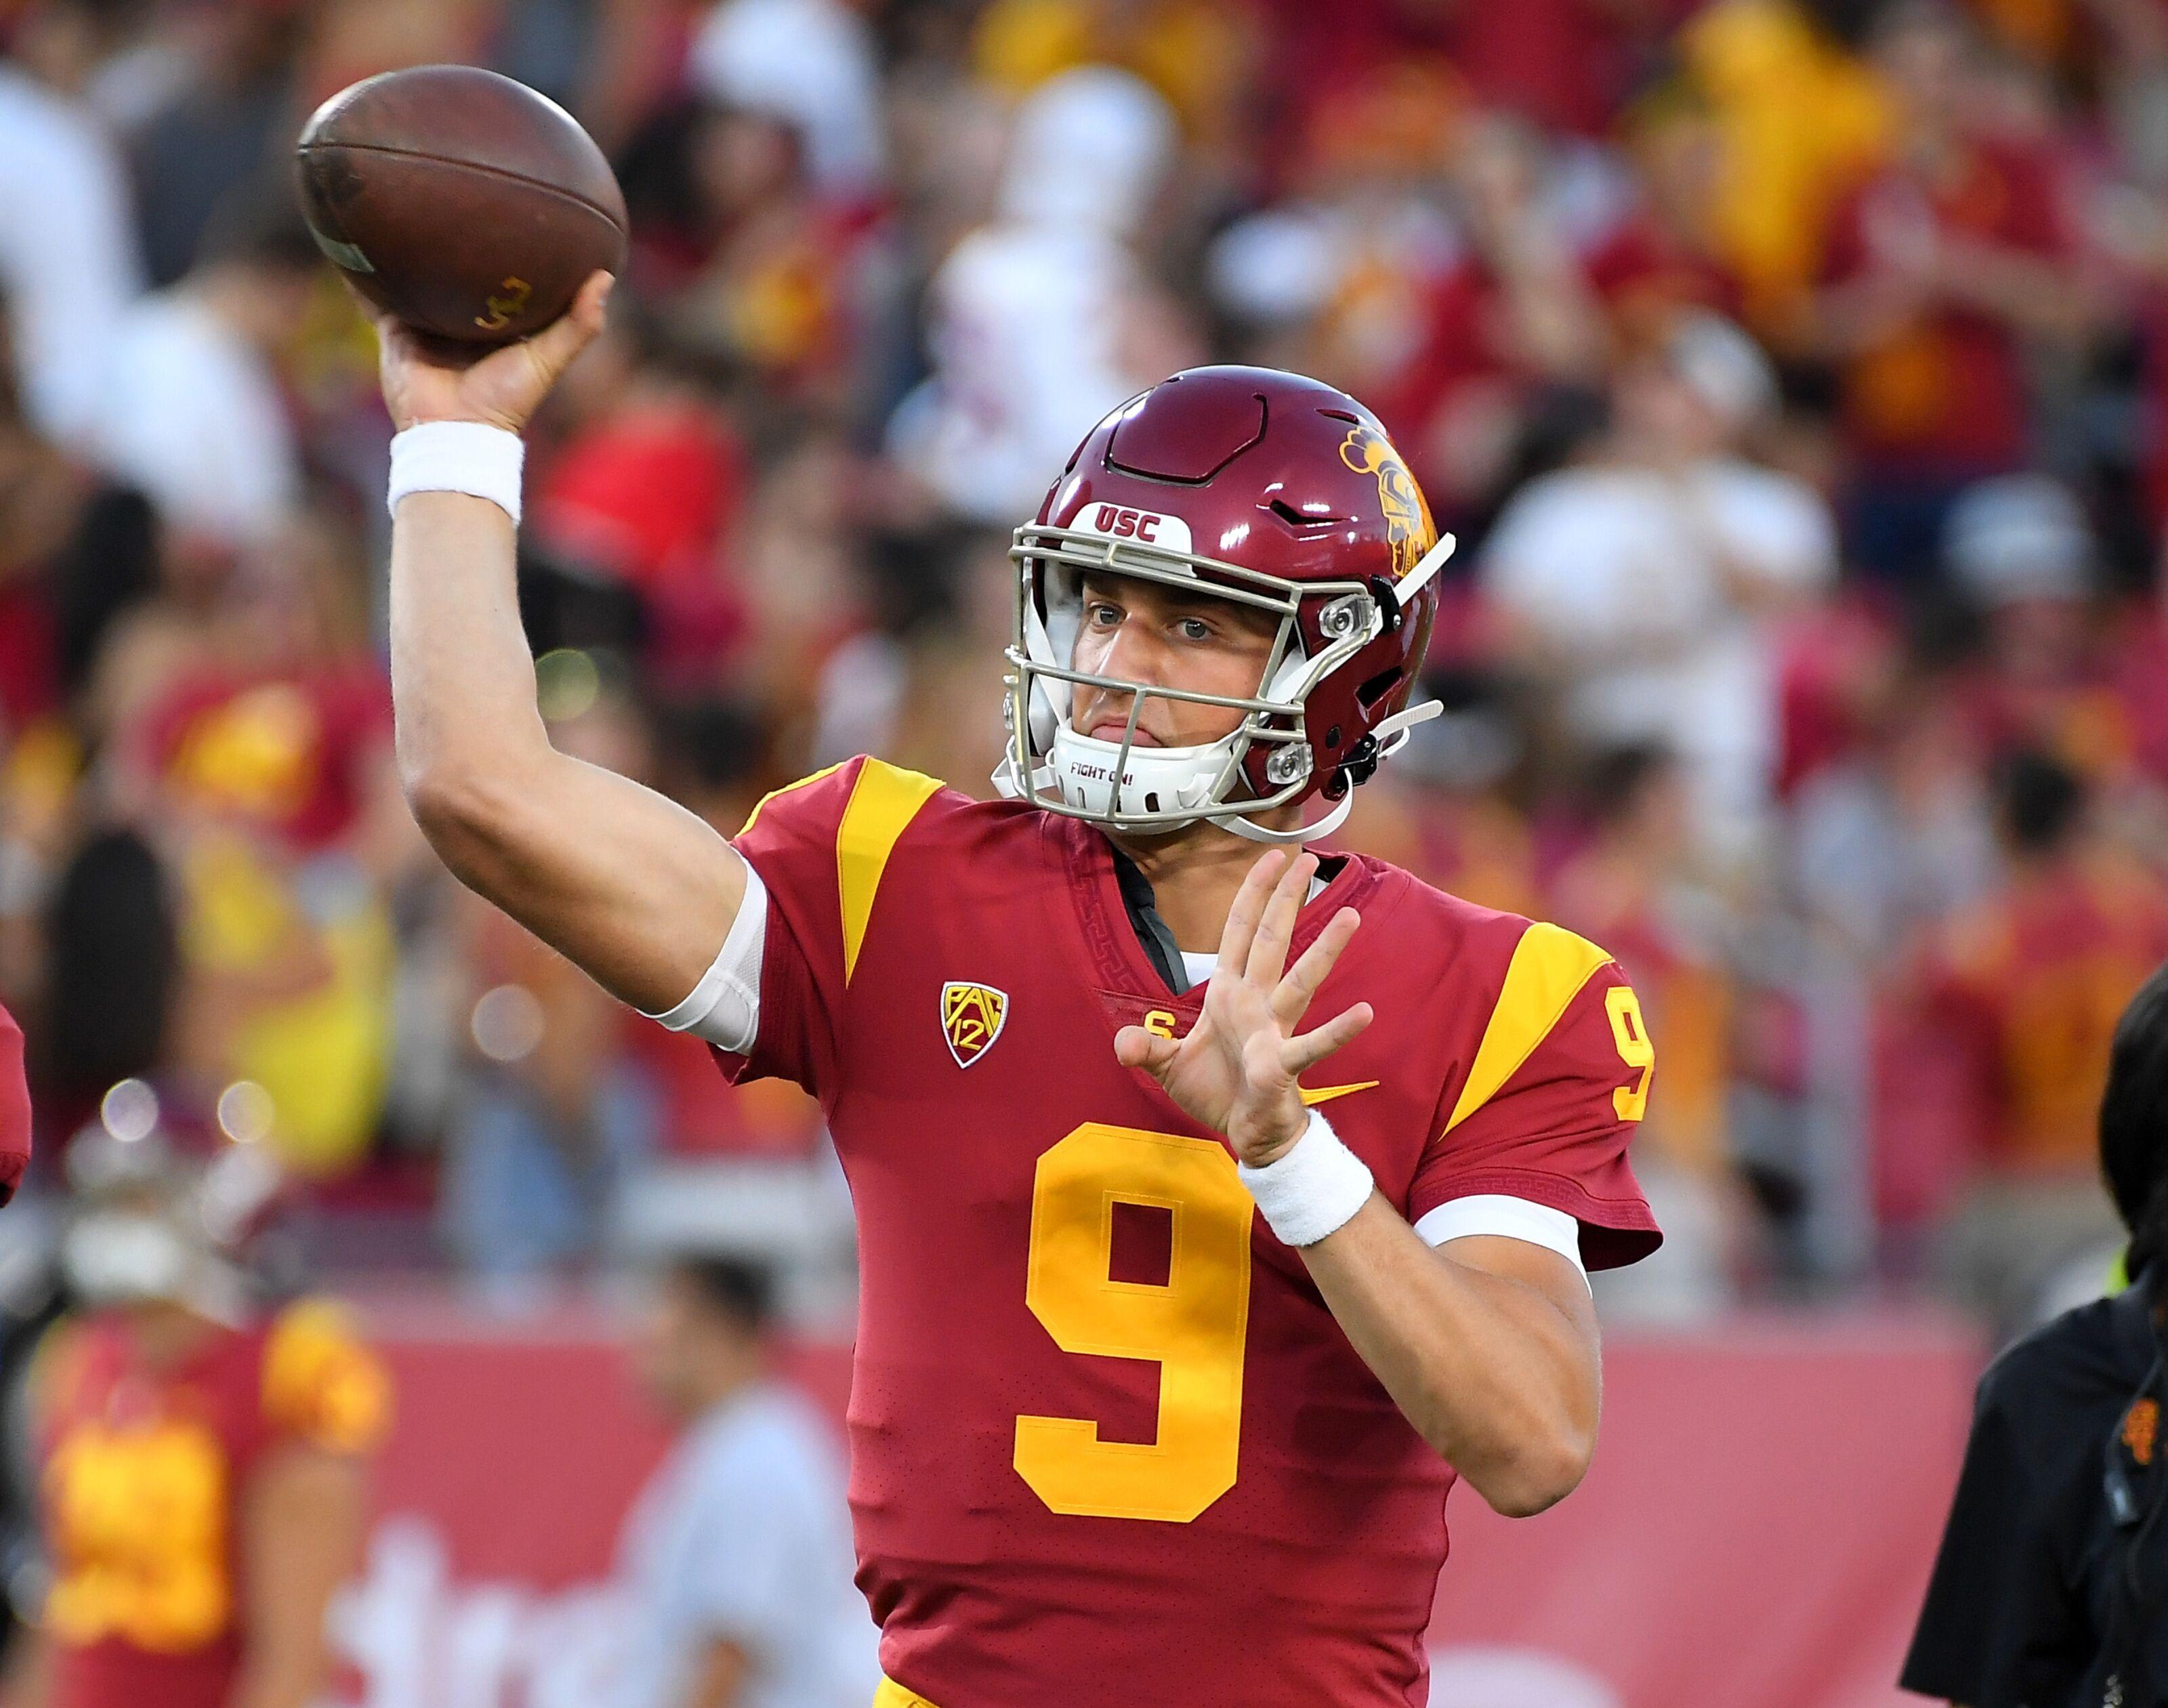 USC Football: 3 takeaways from statement win over Arizona